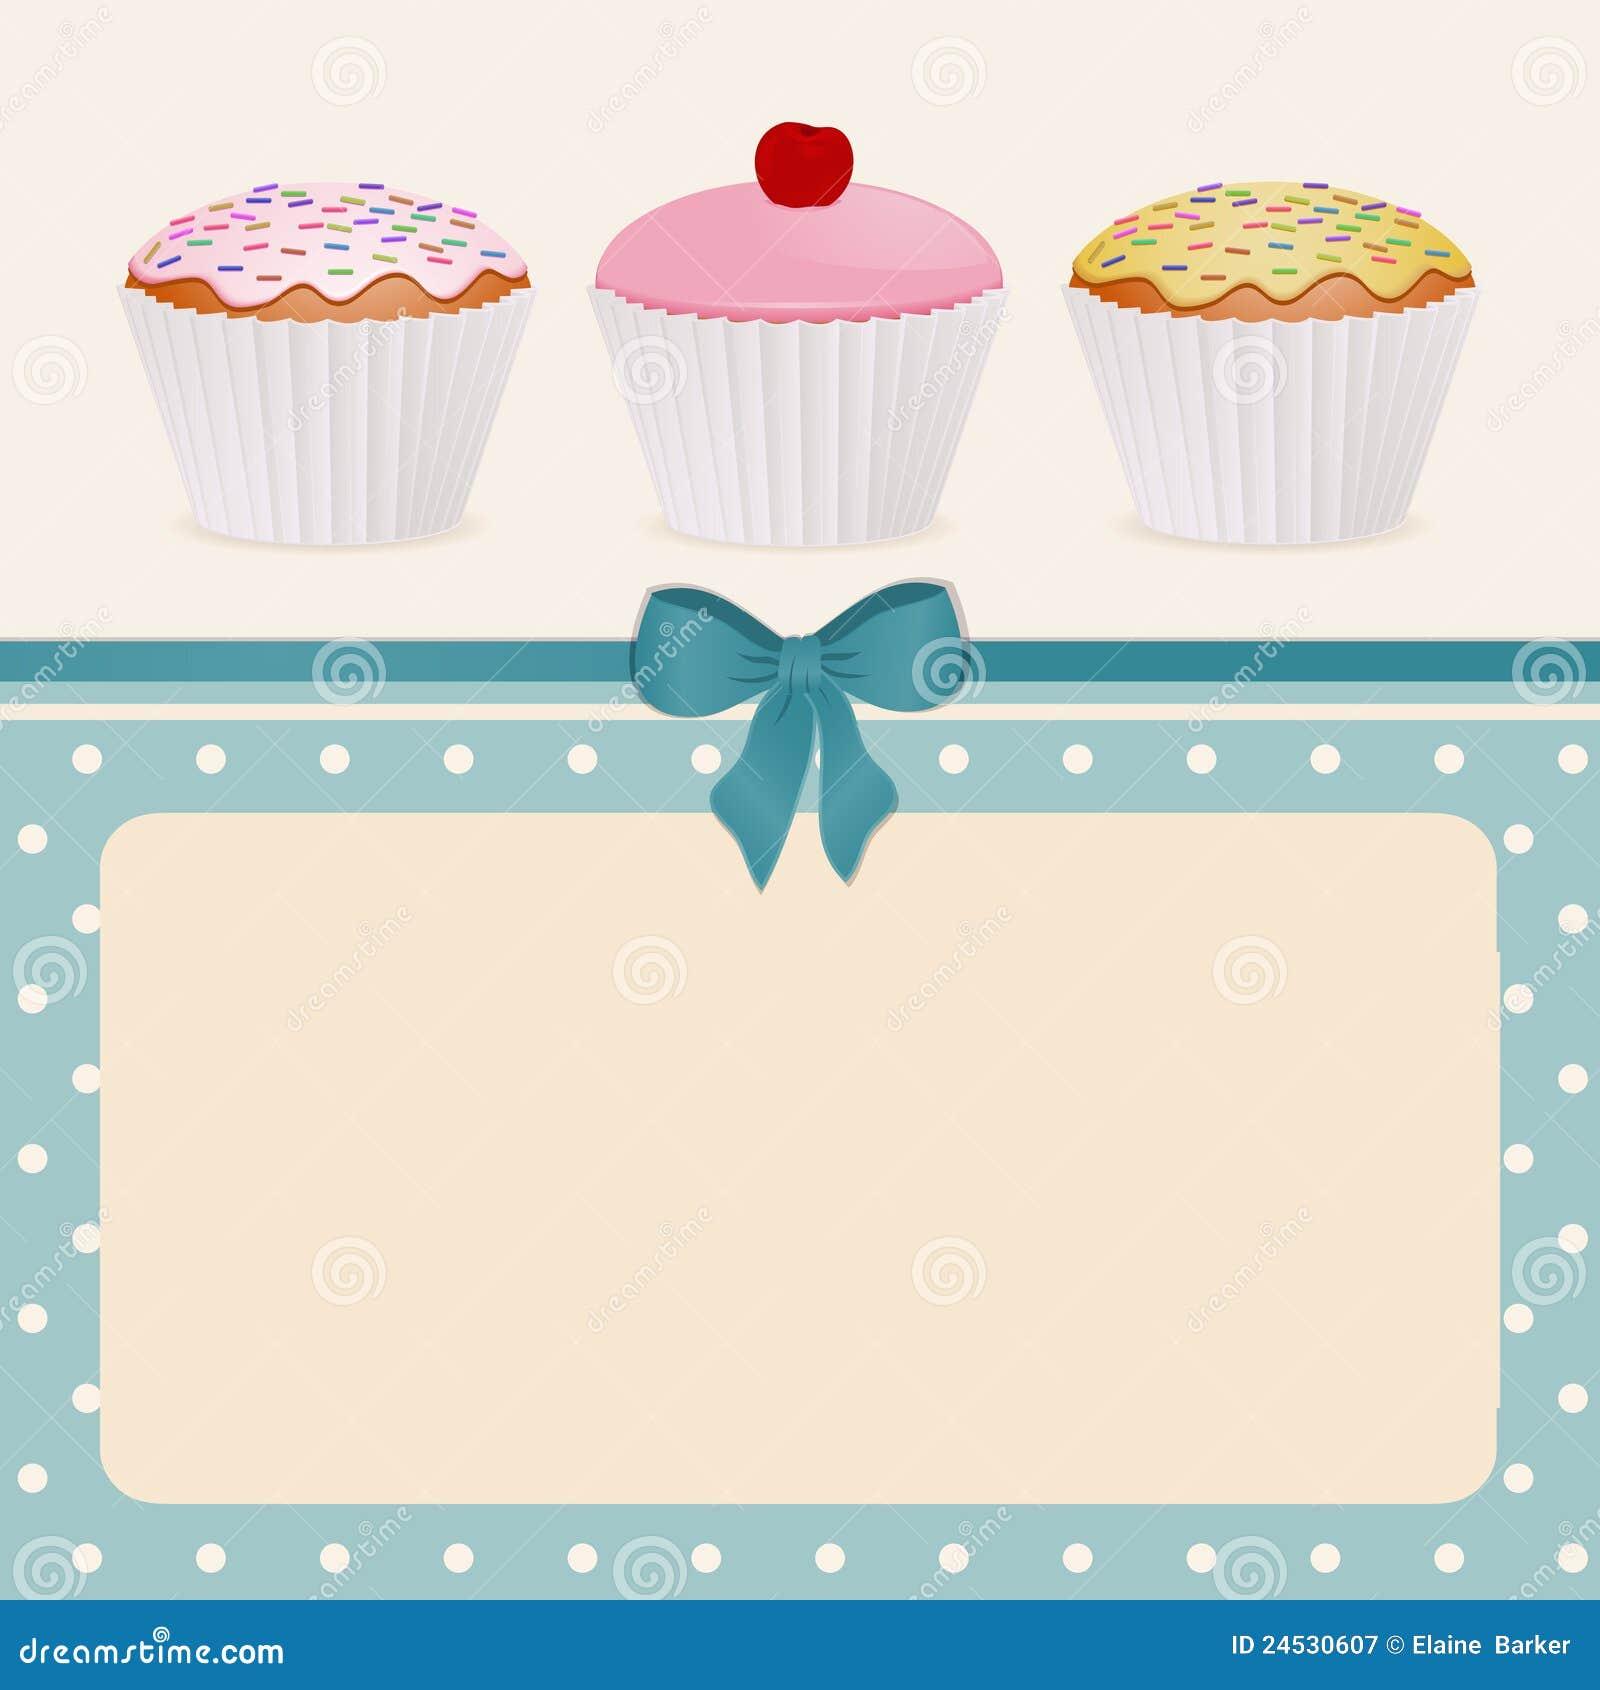 cupcakes on blue polka dot background stock illustration